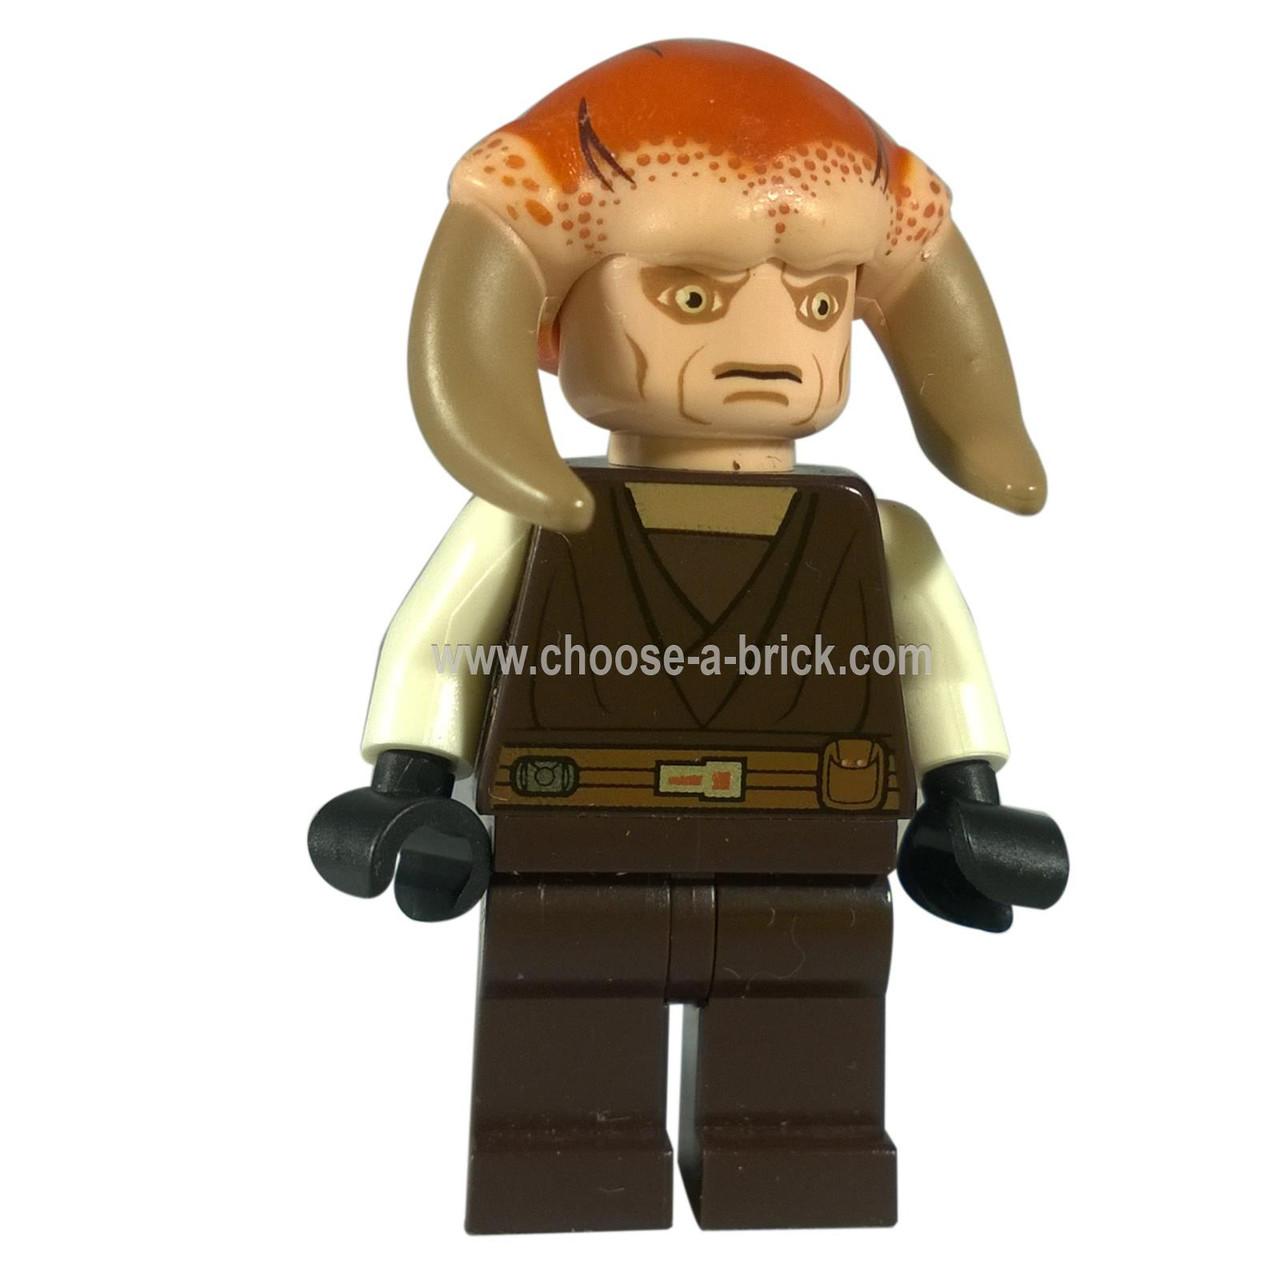 TYPE MINI FIGURINE LEGO  STAR WARS  JEDI  Saesee Tiin